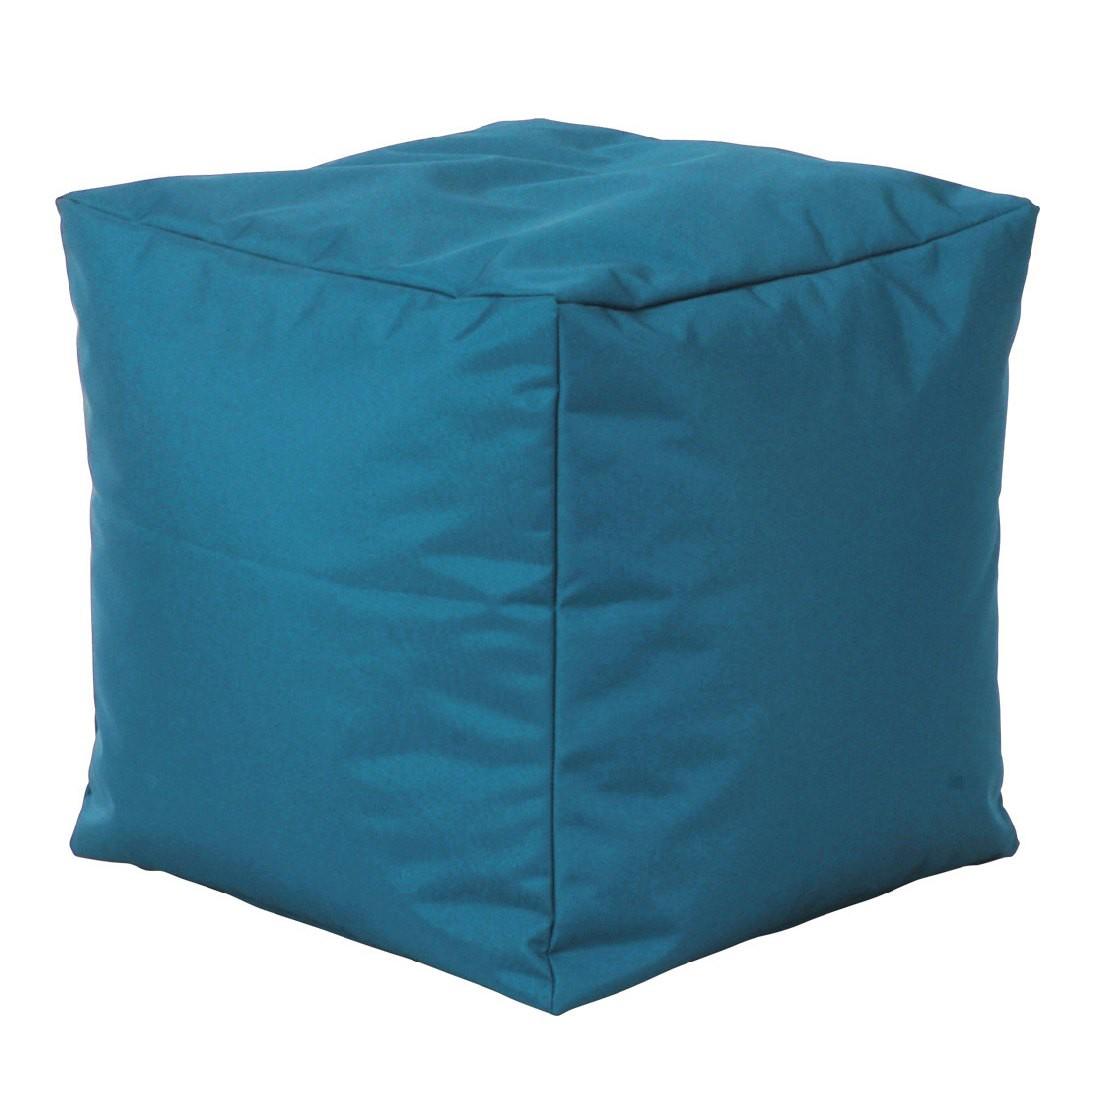 Sitzwürfel Scuba Cube - Stoff Petrol, SITTING POINT